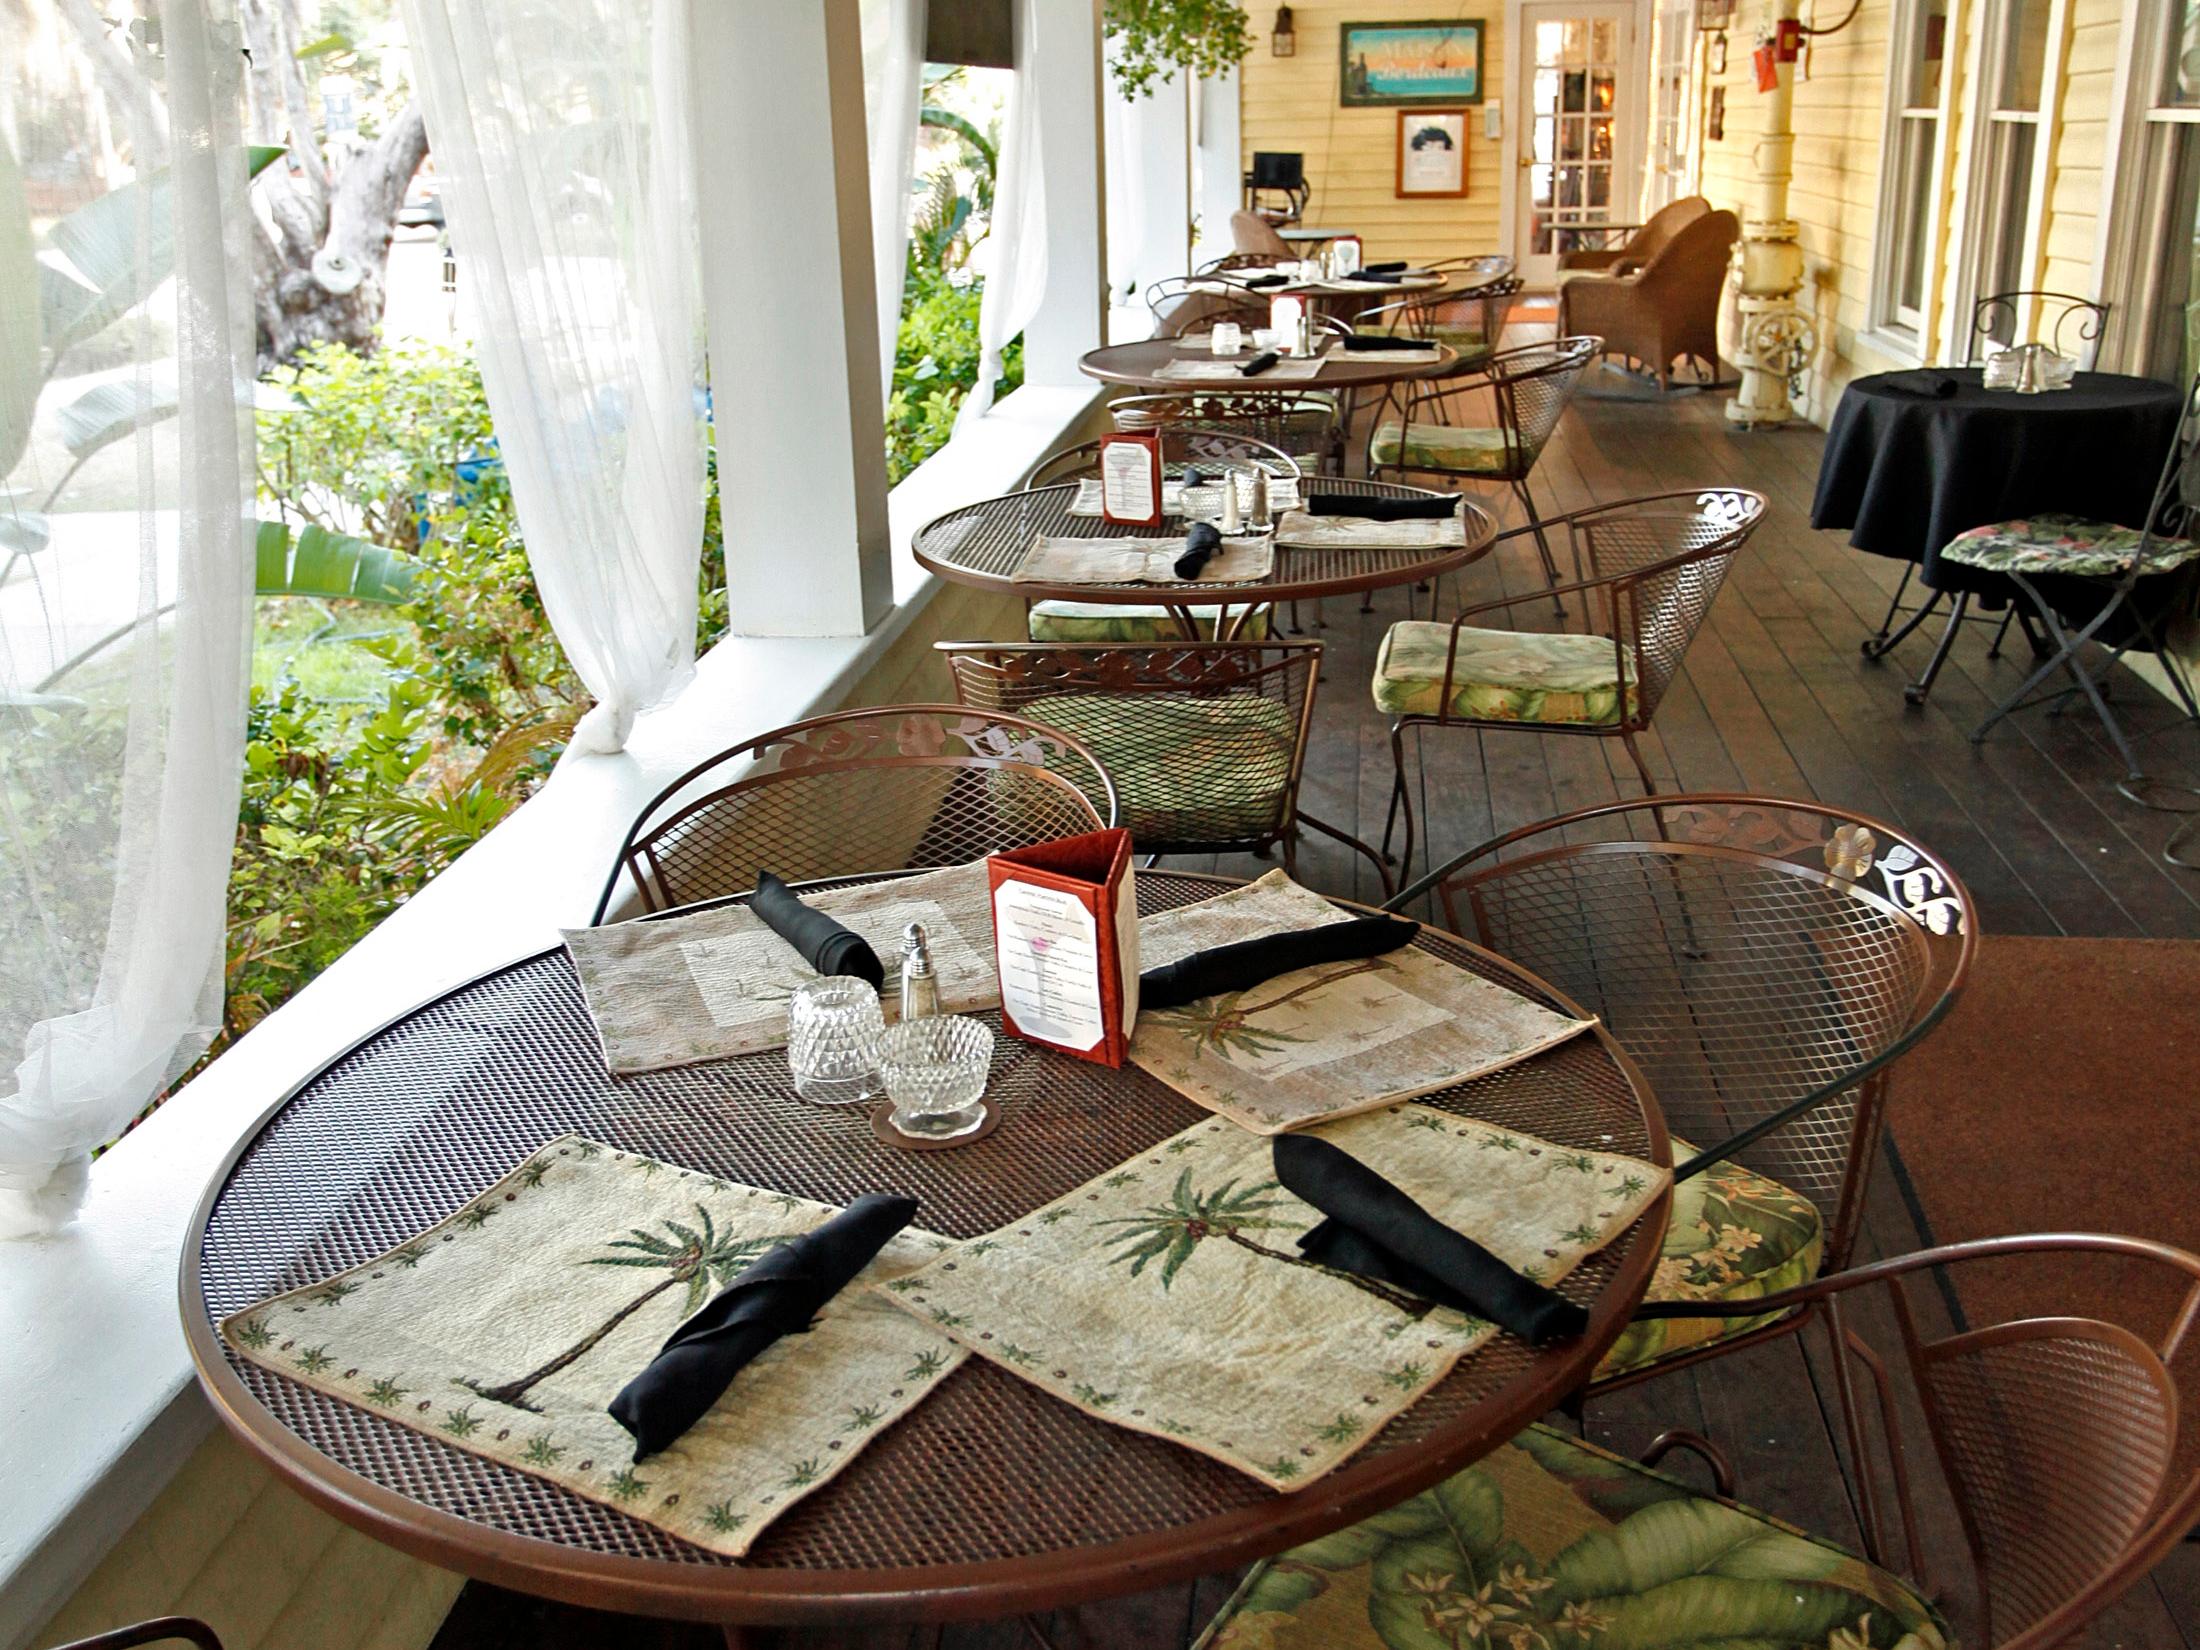 Sarasota Restaurants Open Christmas Eve 2020 Tampa Bay restaurants open on Christmas Eve and Christmas Day